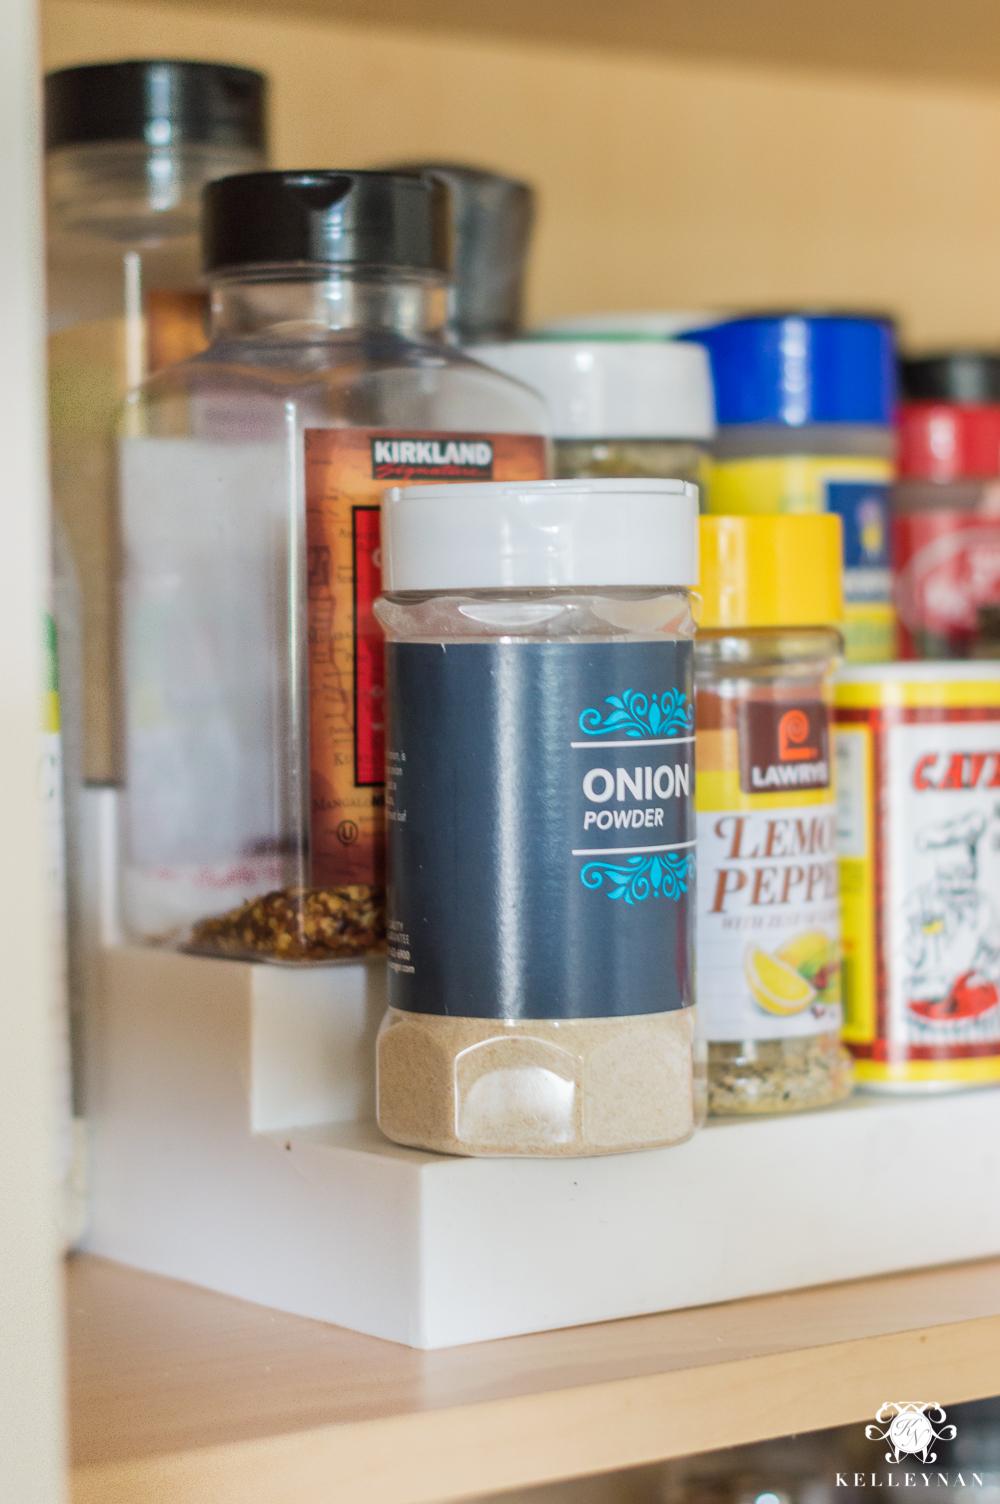 Organized Spice And Baking Cabinet  Kitchen Organization  Spice Riser  Organization